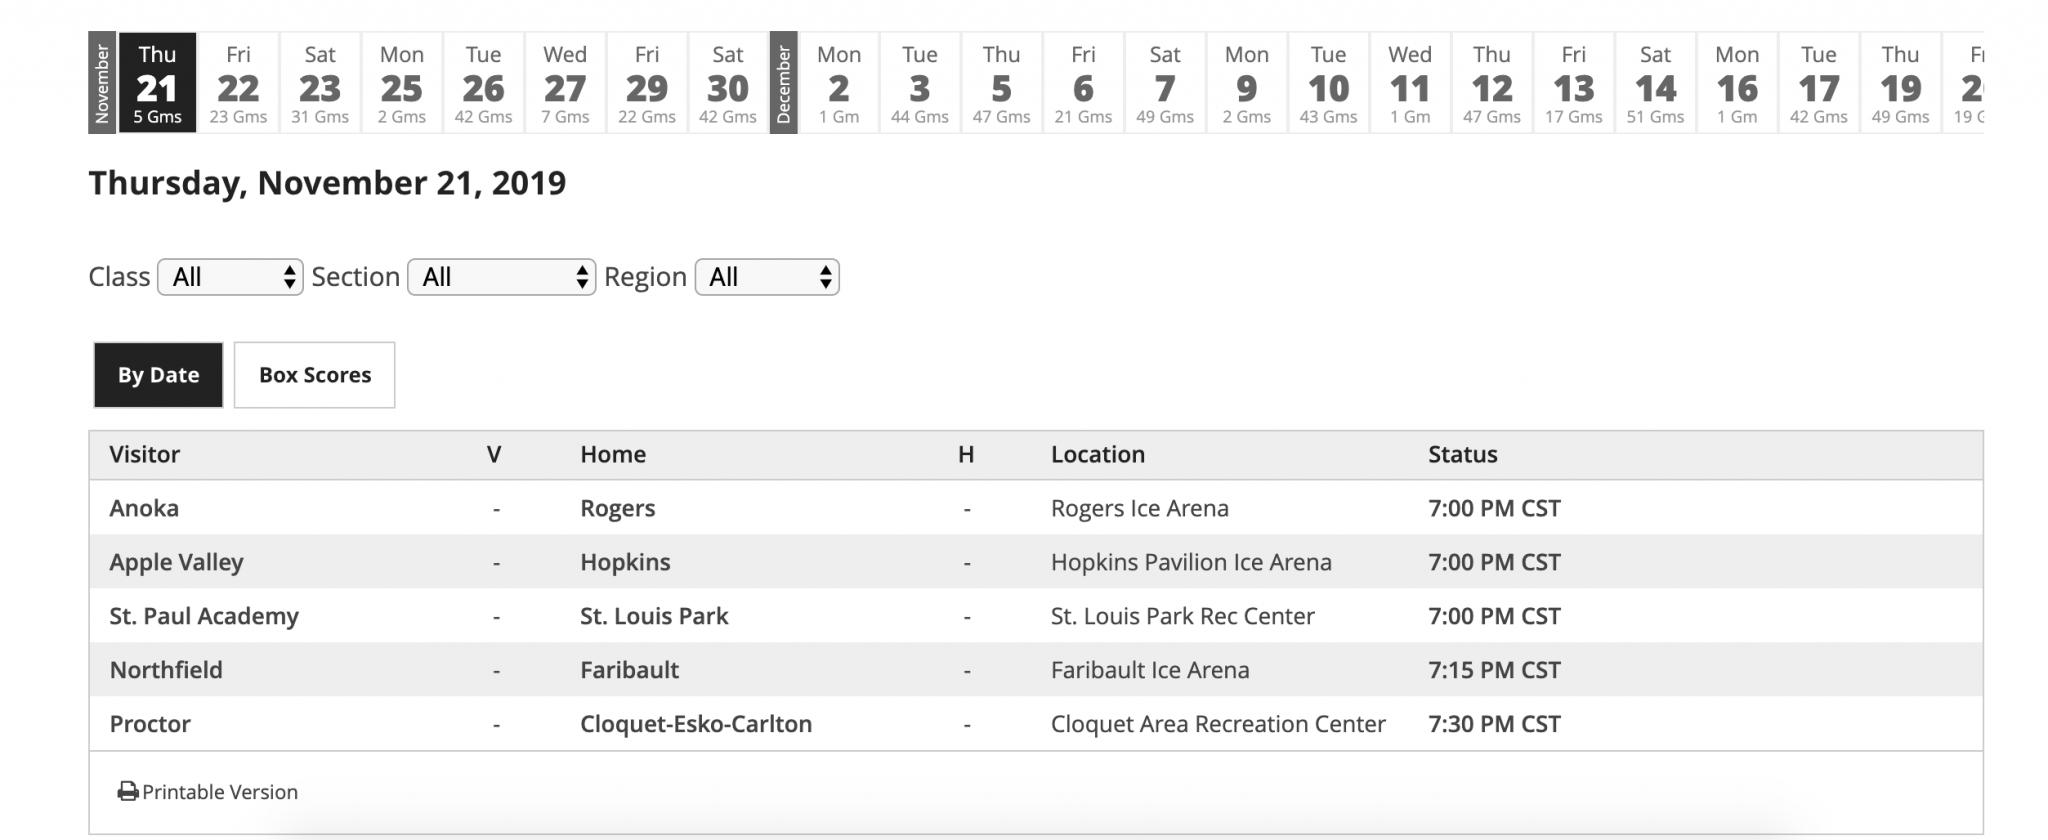 Mifflin County School Ddistrict Calendar 2021 2020 Throughout Hesperia School District Calendar 2022